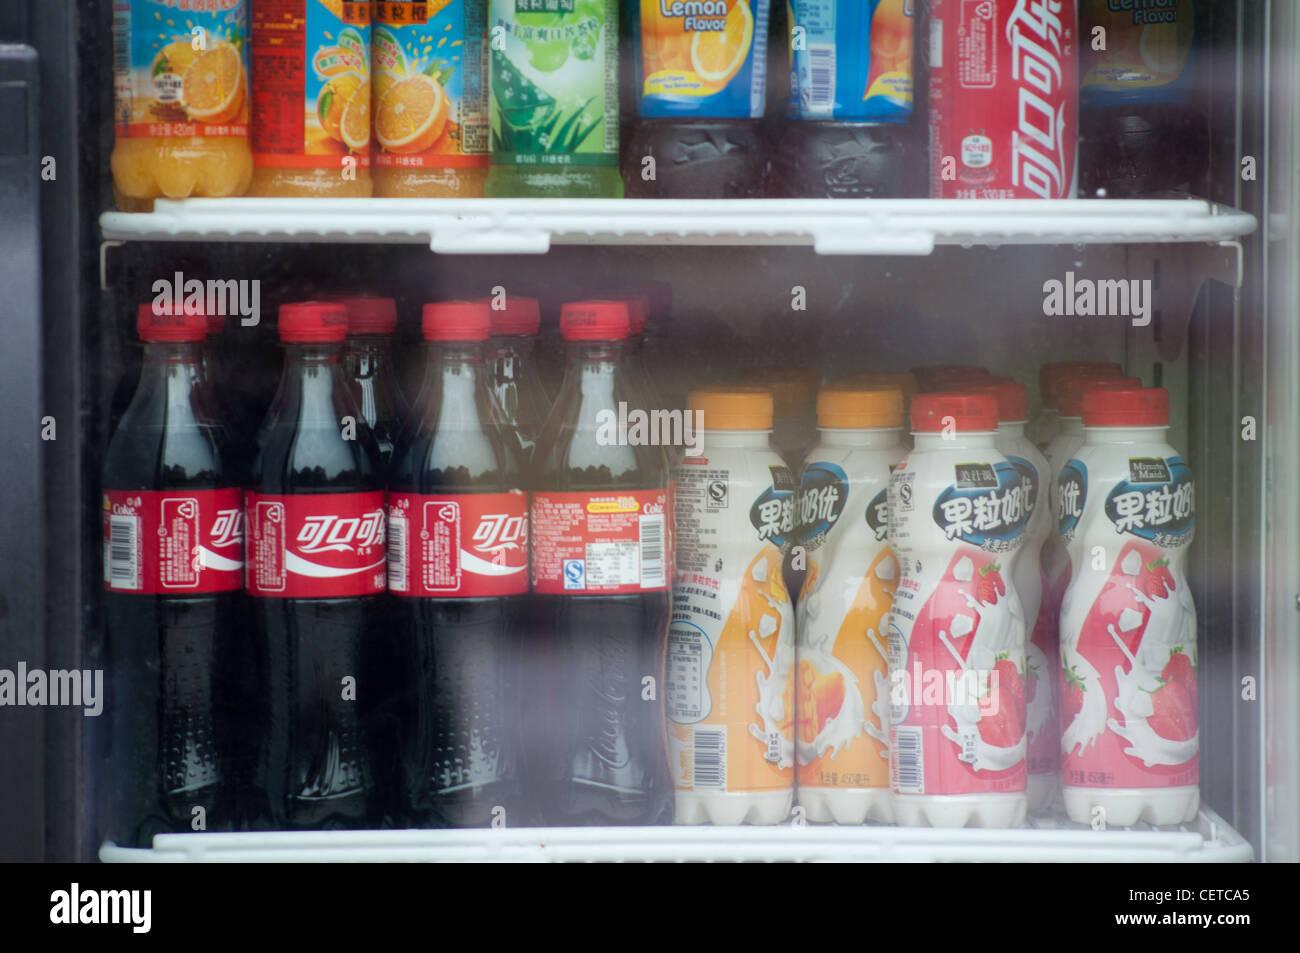 Kühlschrank Coco Cola : Coca cola getränk im kühlschrank stockfoto bild: 43562461 alamy